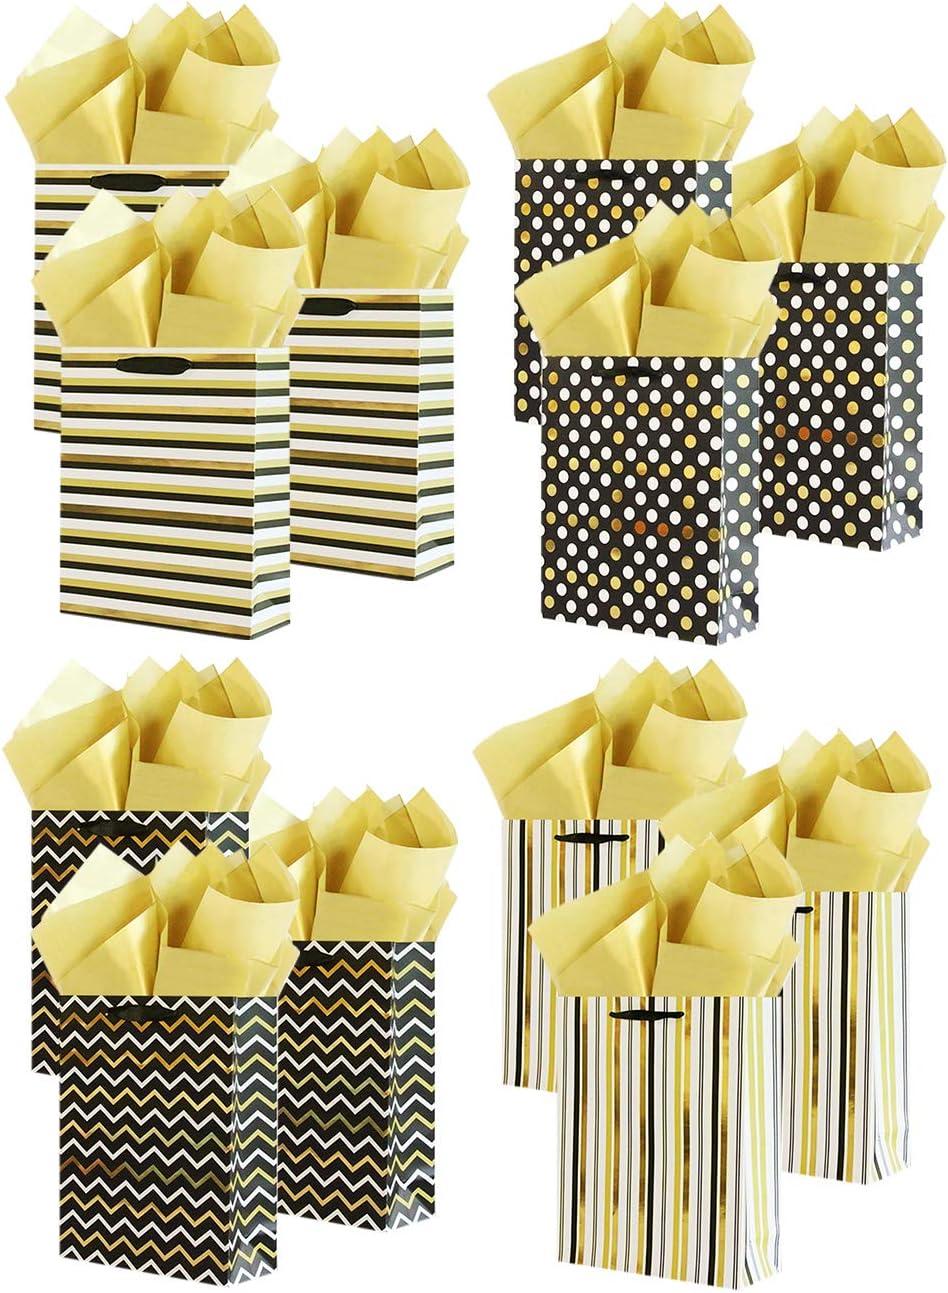 Boston Mall UNIQOOO 12Pcs Assorted Gold Metallic Gift Max 52% OFF Bulk Bags Large Foil